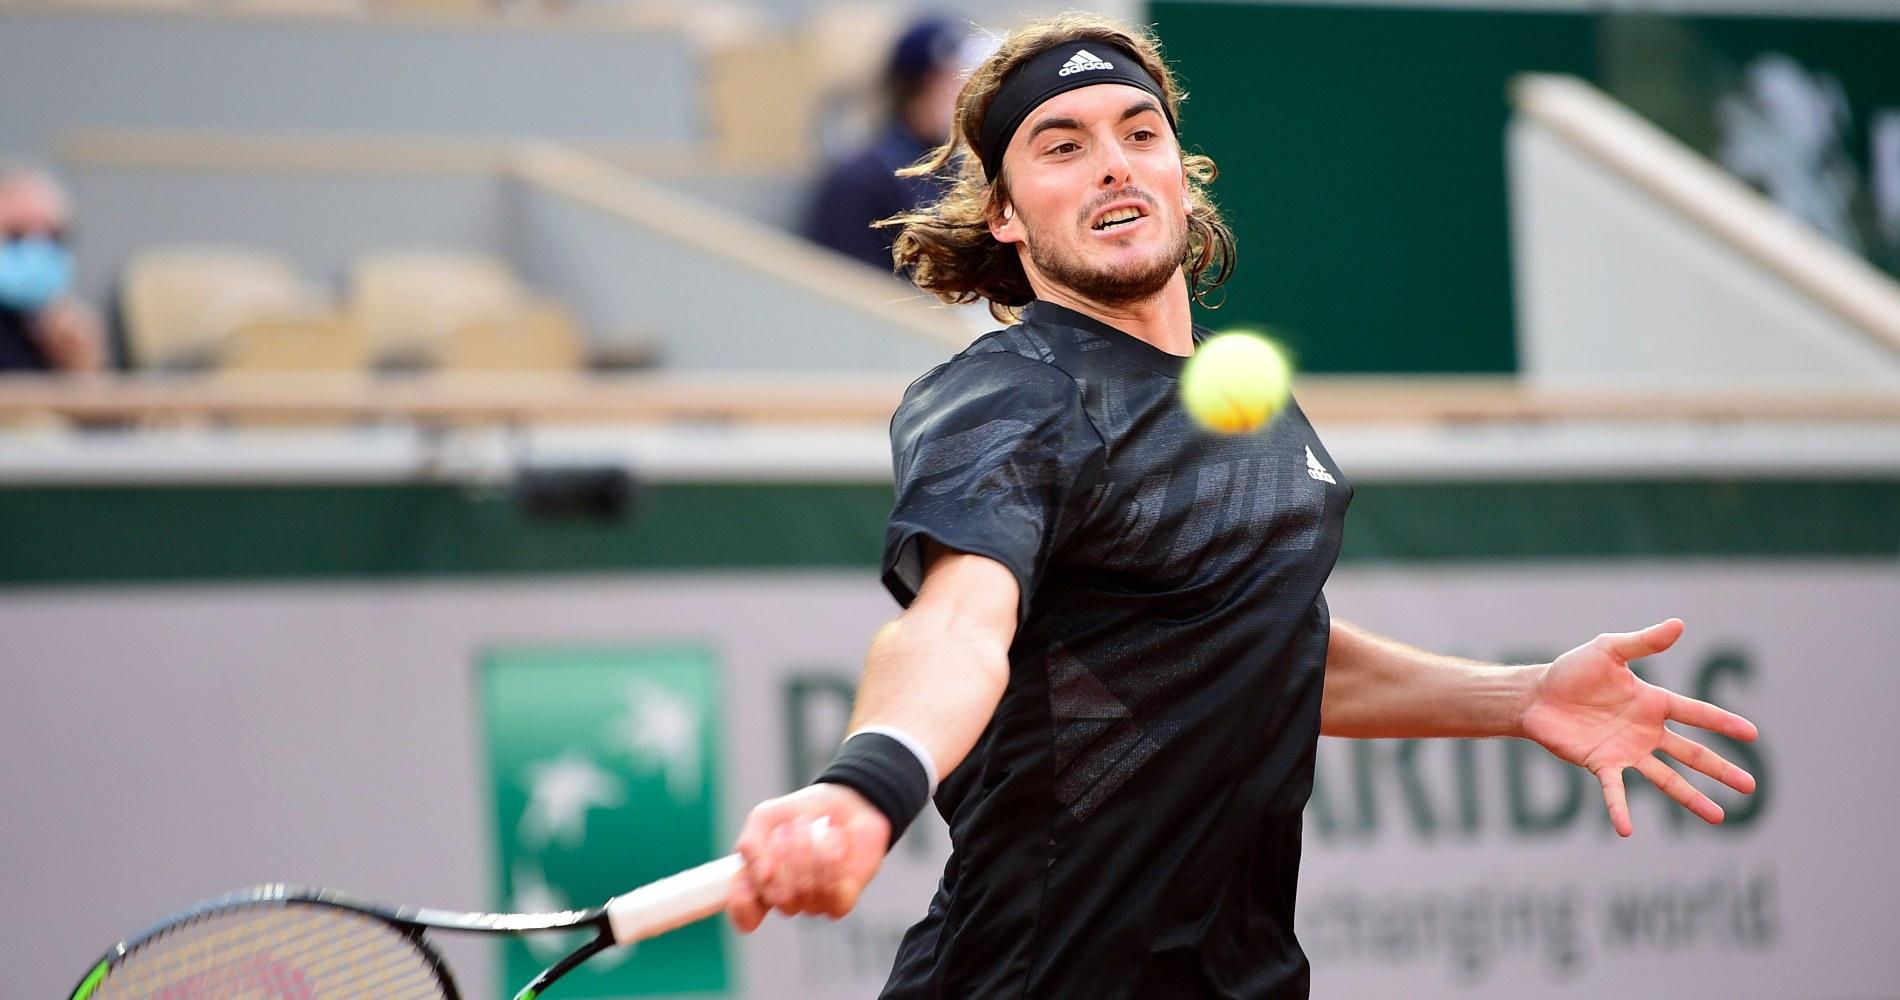 Tsitsipas Roland Garros 2020